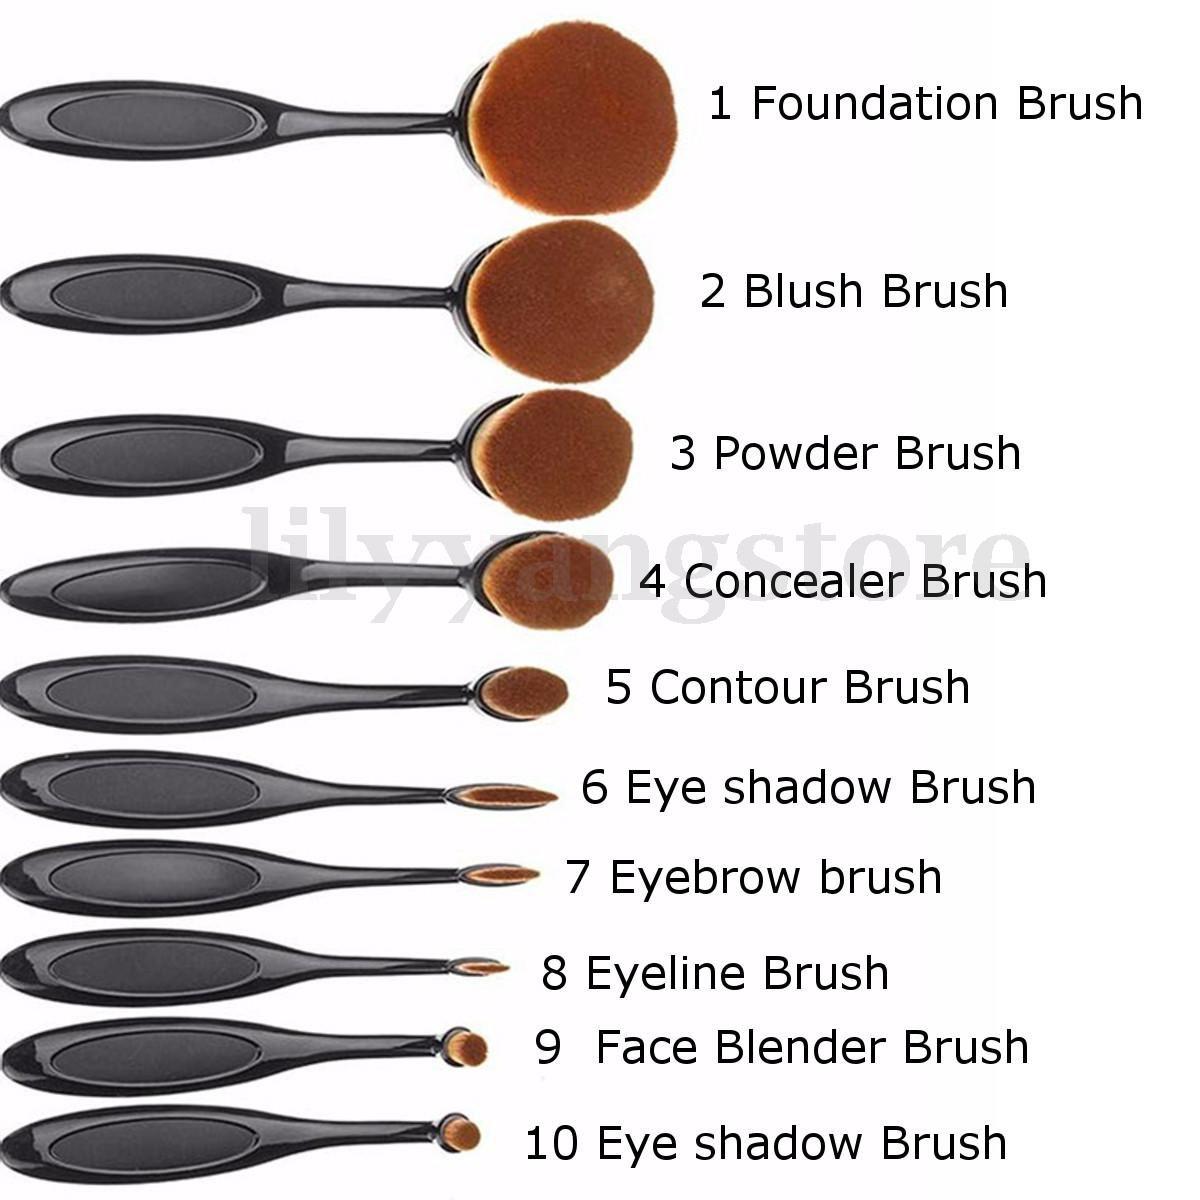 makeup tools names. makeup brushes tools names